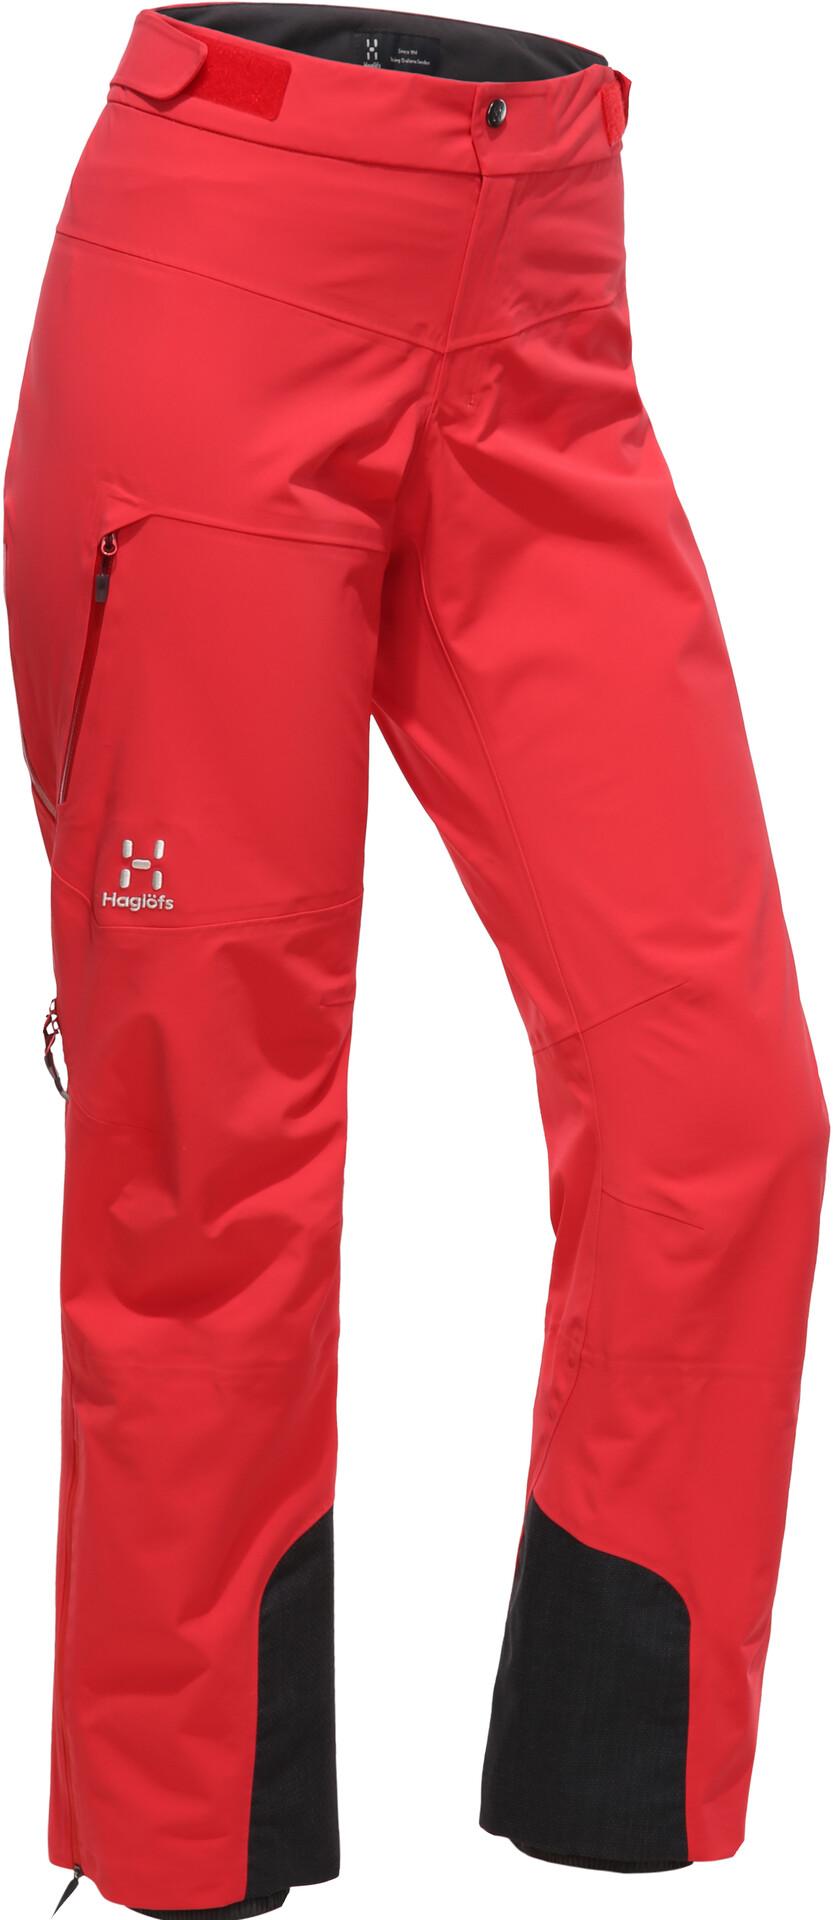 Haglöfs L.I.M Touring Proof Pantaloni Donna, hibiscus red su Addnature V5ZLX